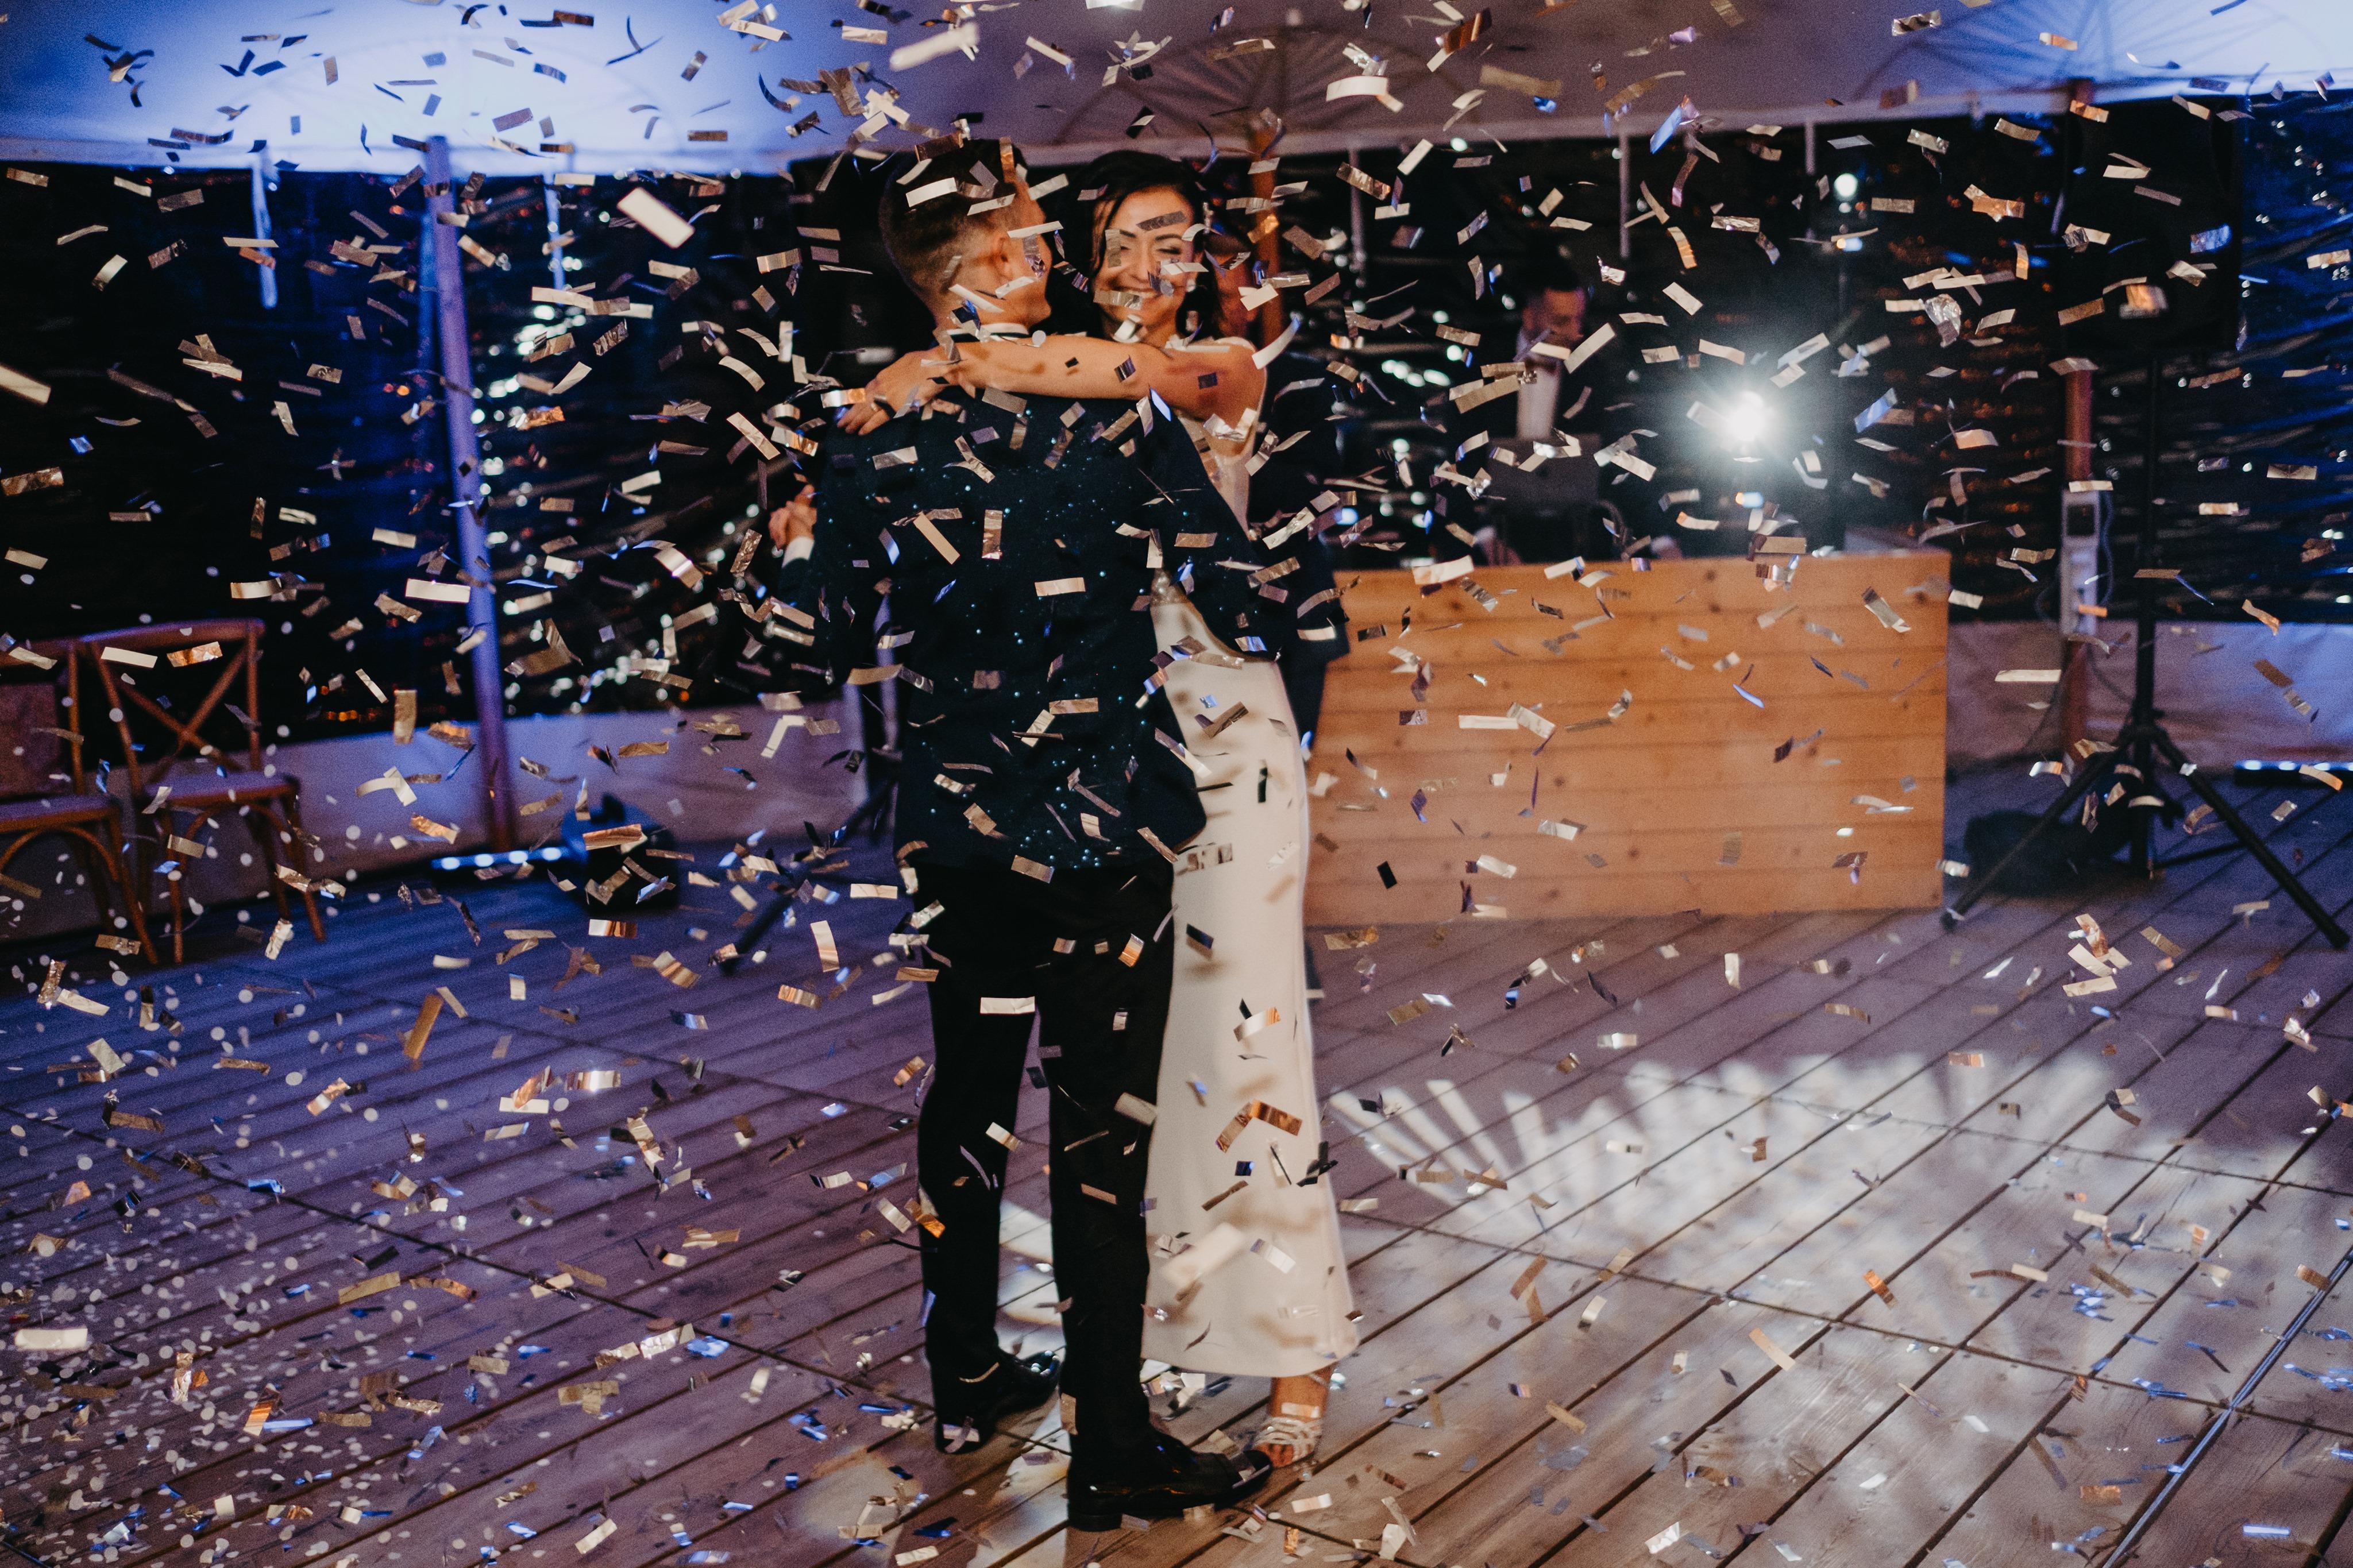 nasvietenie-osvetlenie-saly-svadbajpg